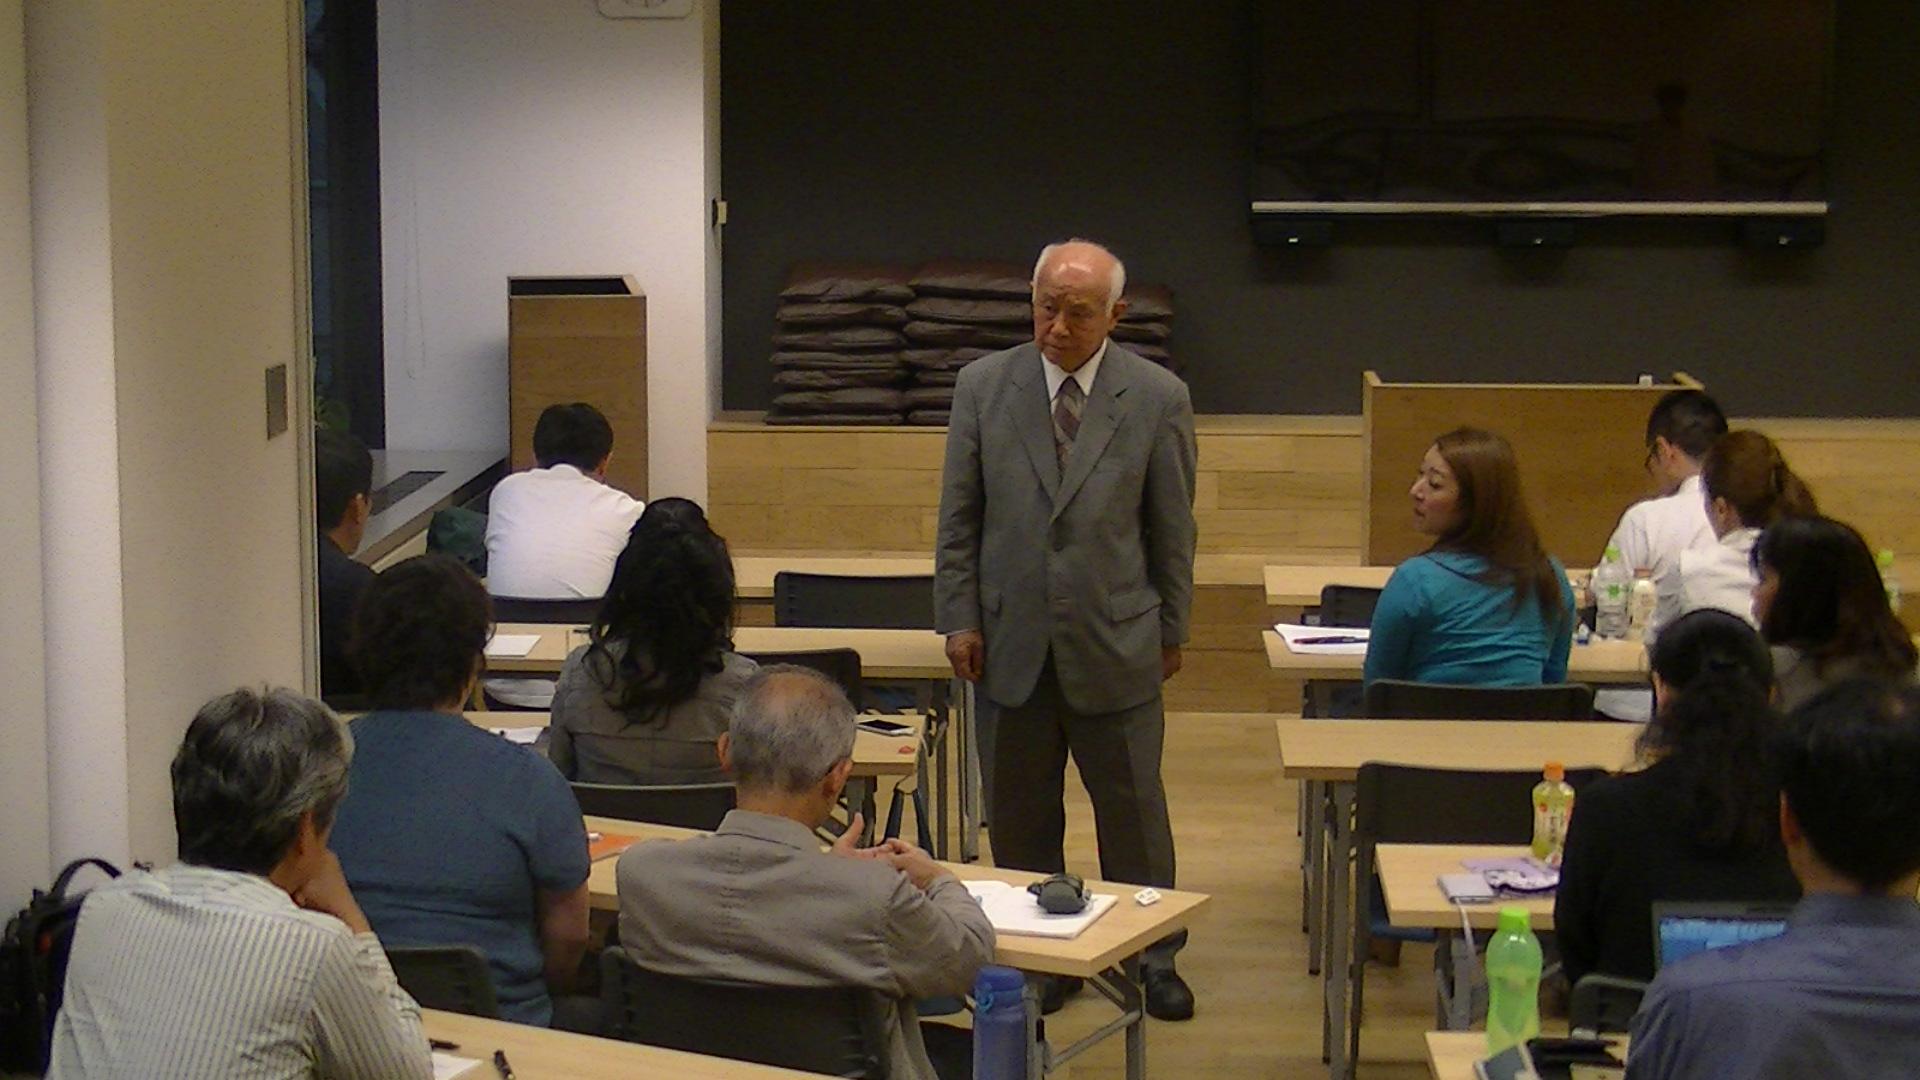 PIC 0590 - 4月1日東京思風塾の開催になります。